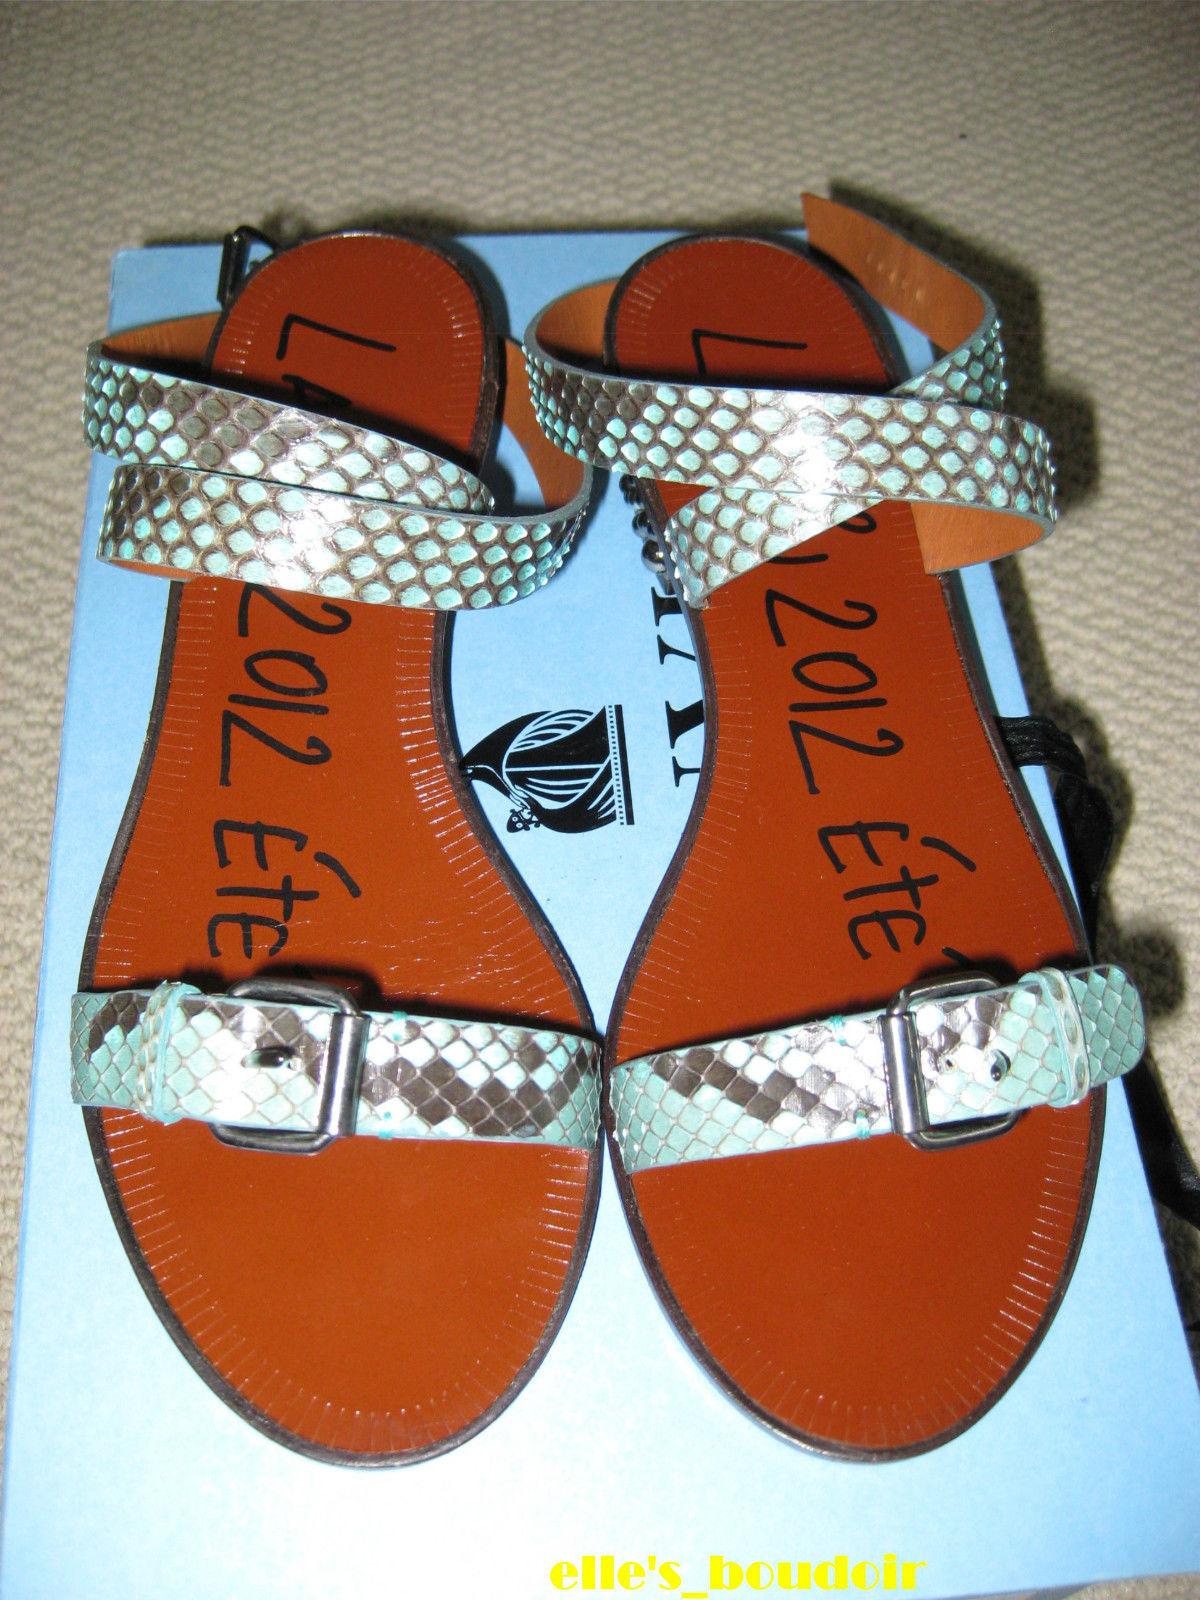 NIB Lanvin Python Studded Heel Sandals Shoes 36.5 $1190